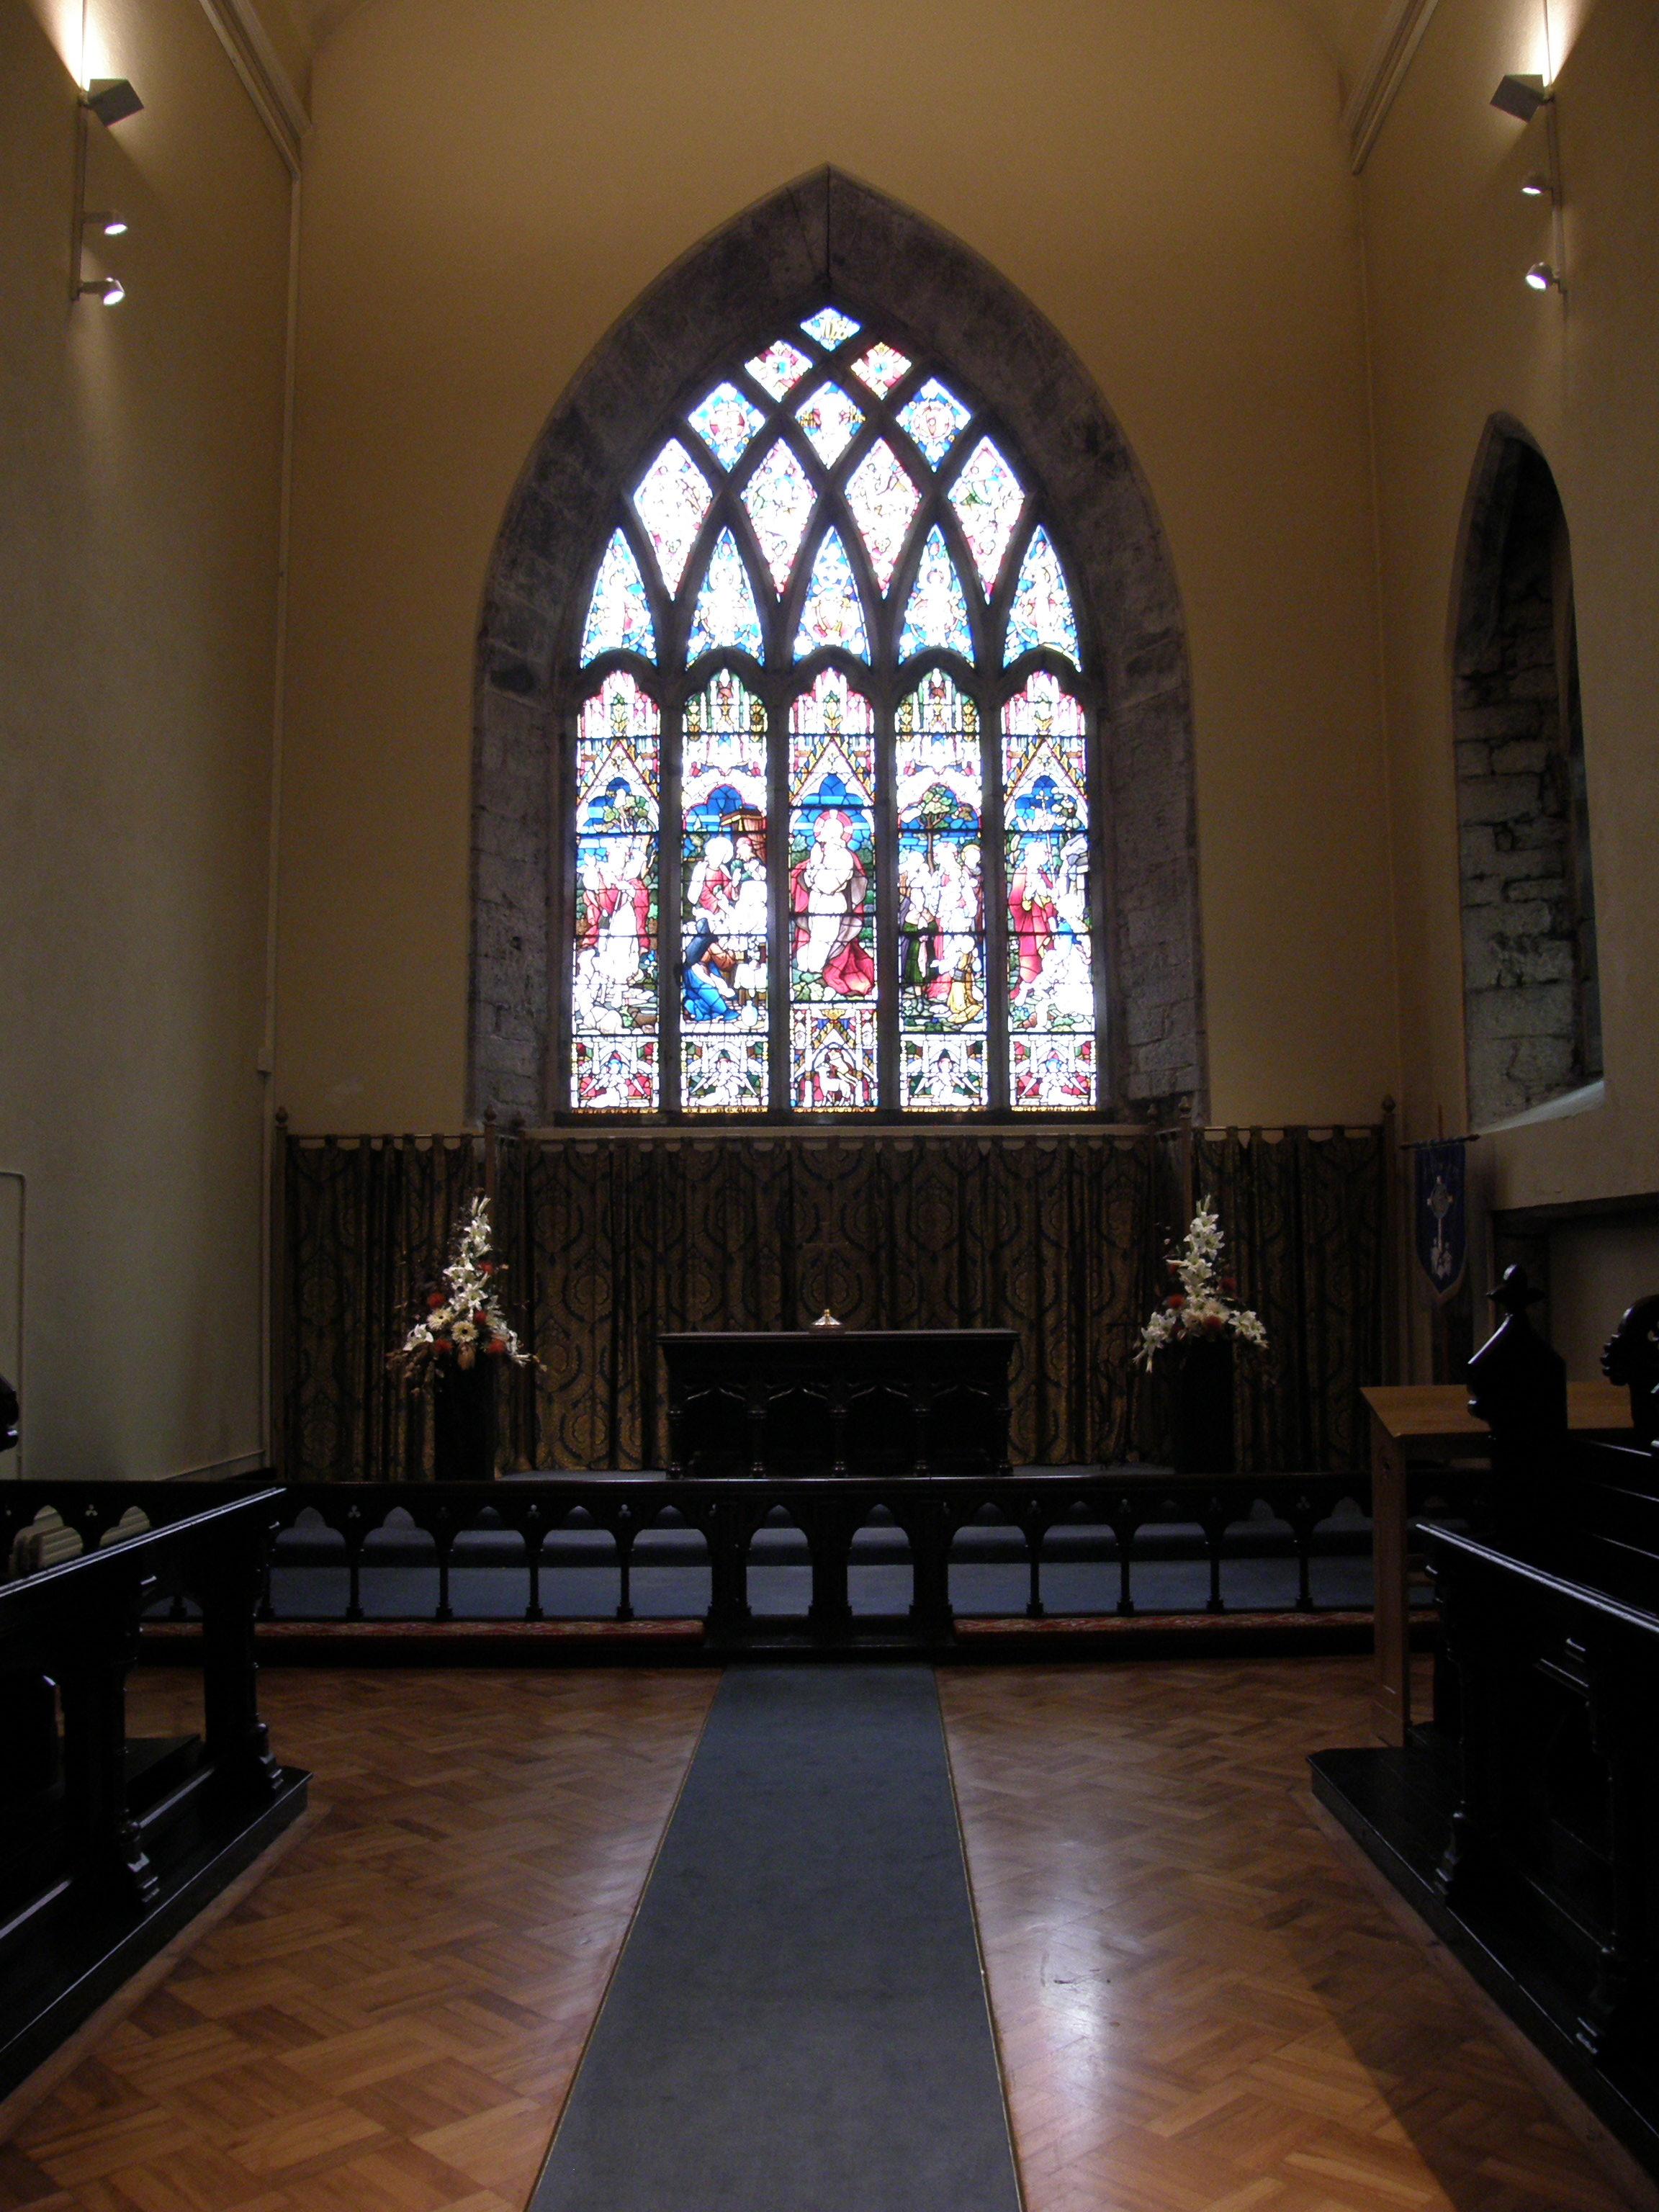 Chancel and High Altar, St. Nicholas Church, Galway